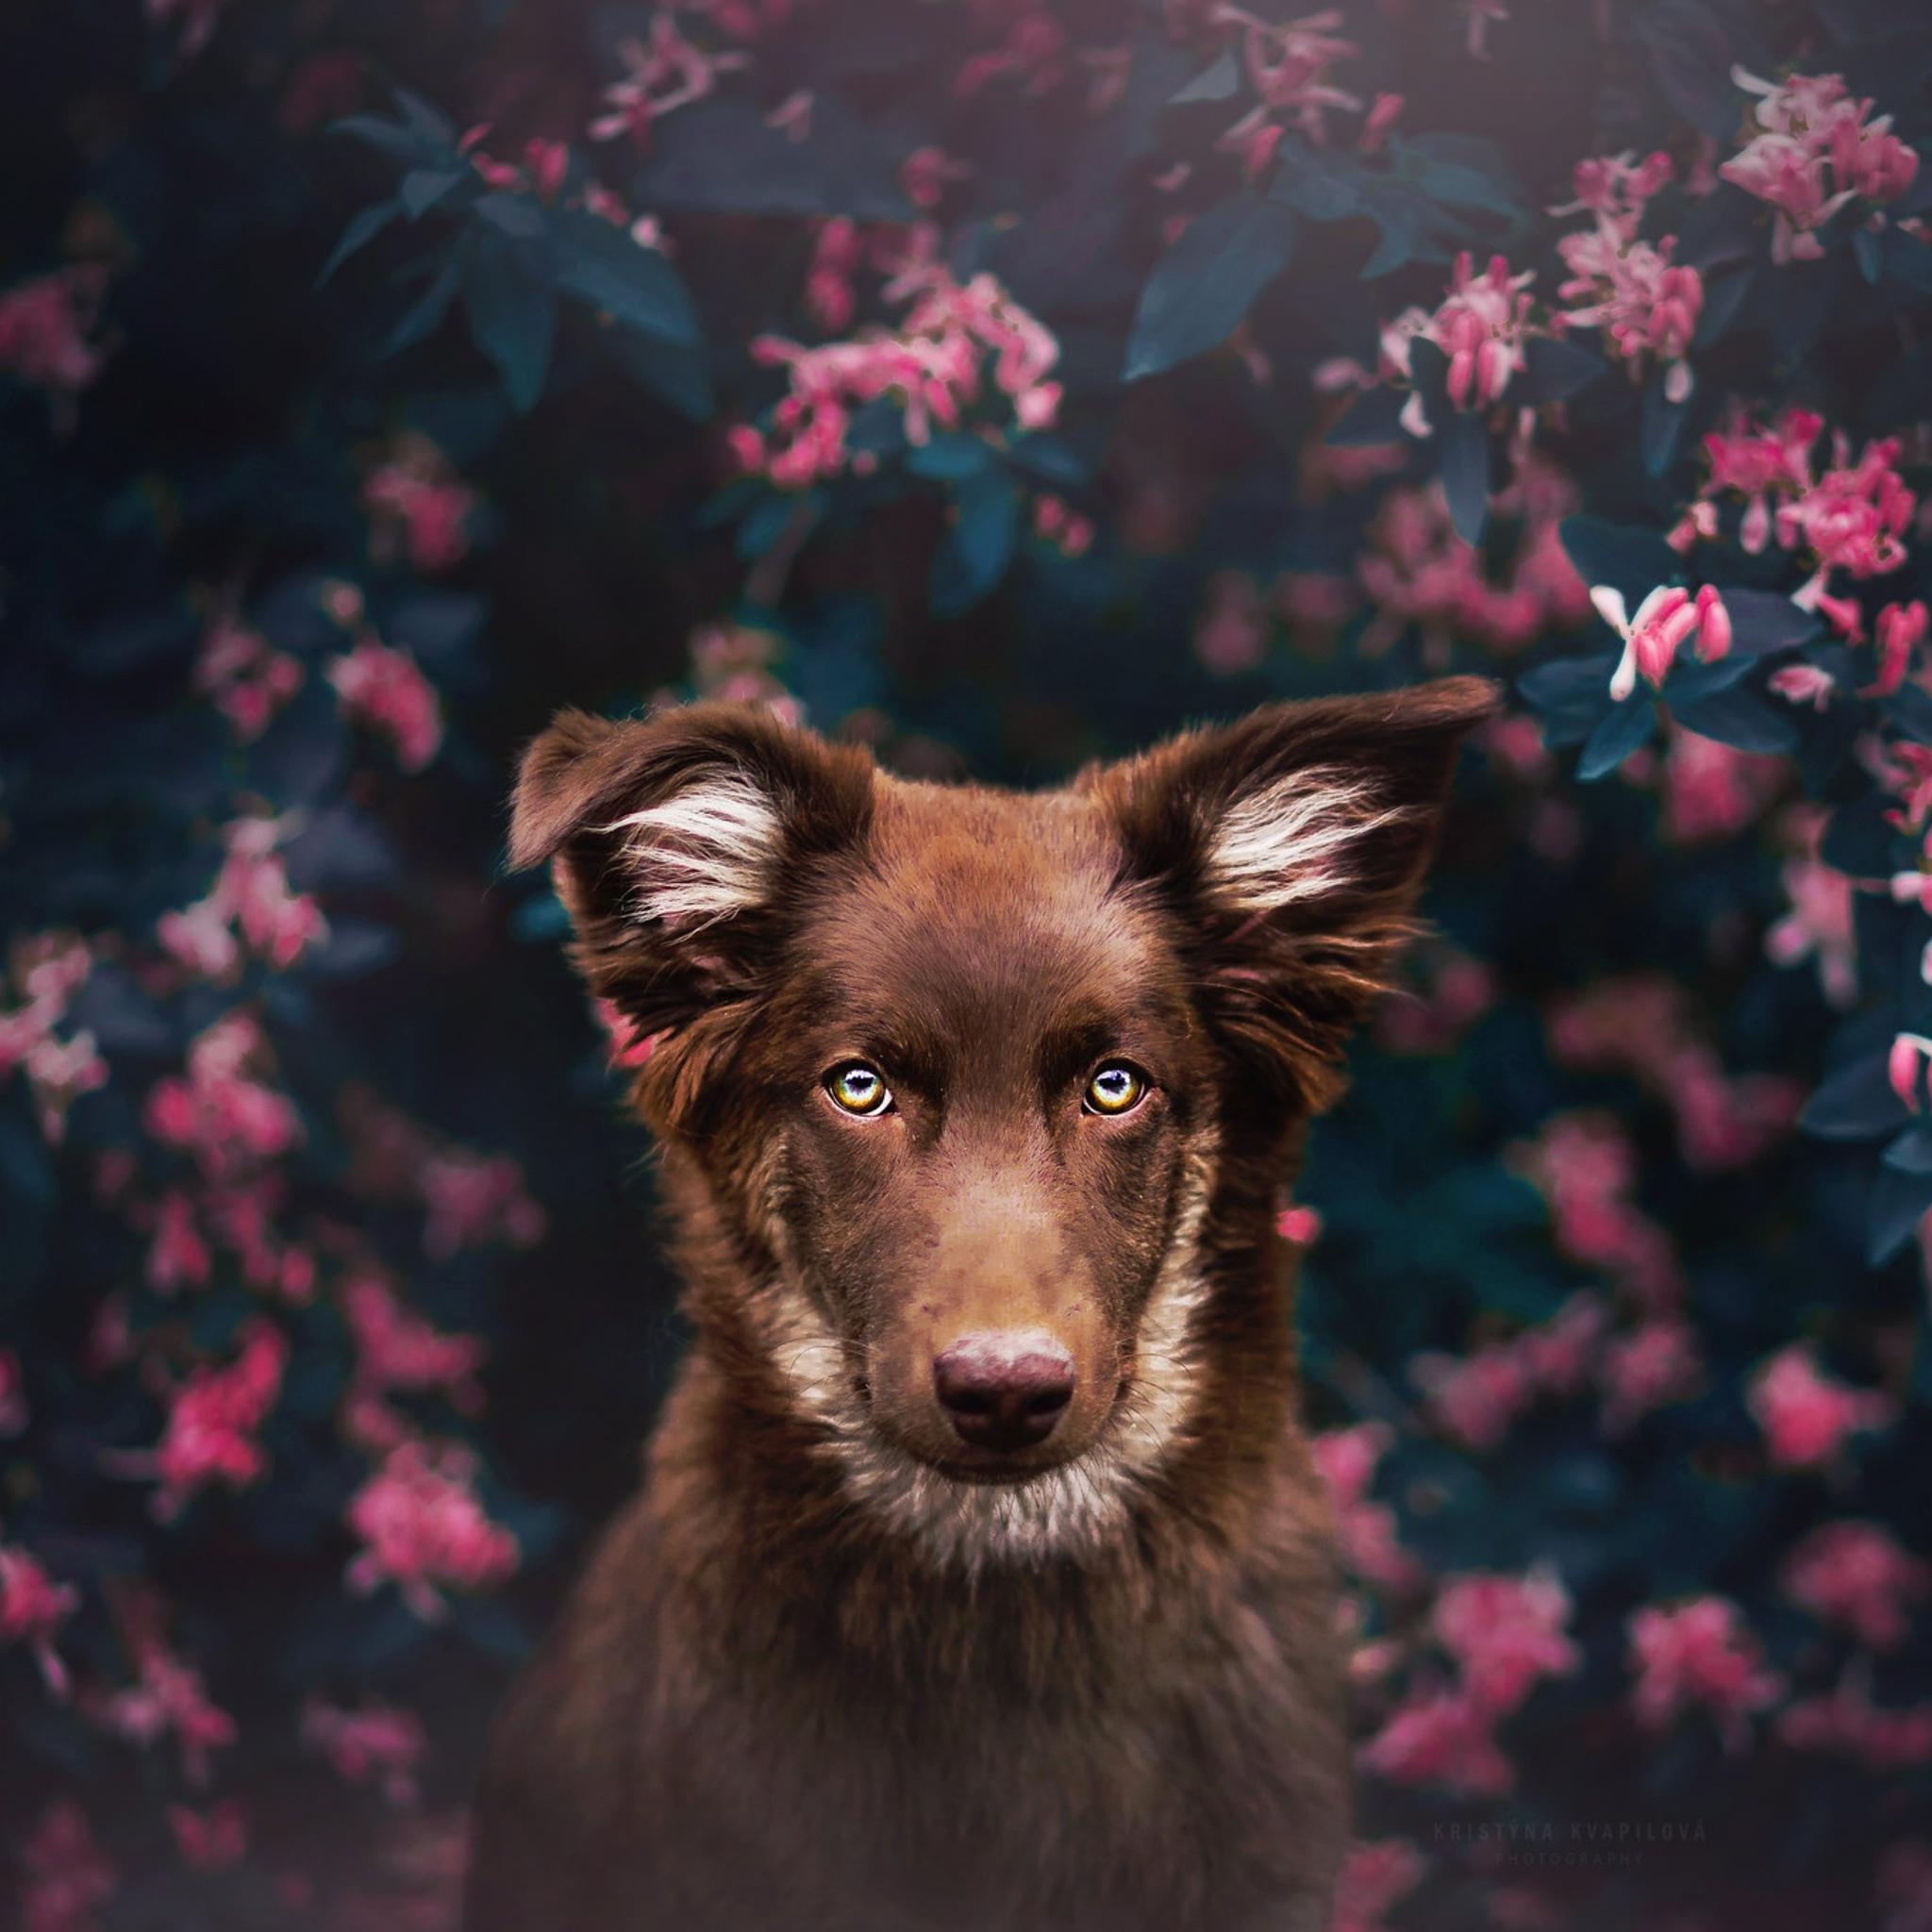 dog-attractive-eyes-kk.jpg